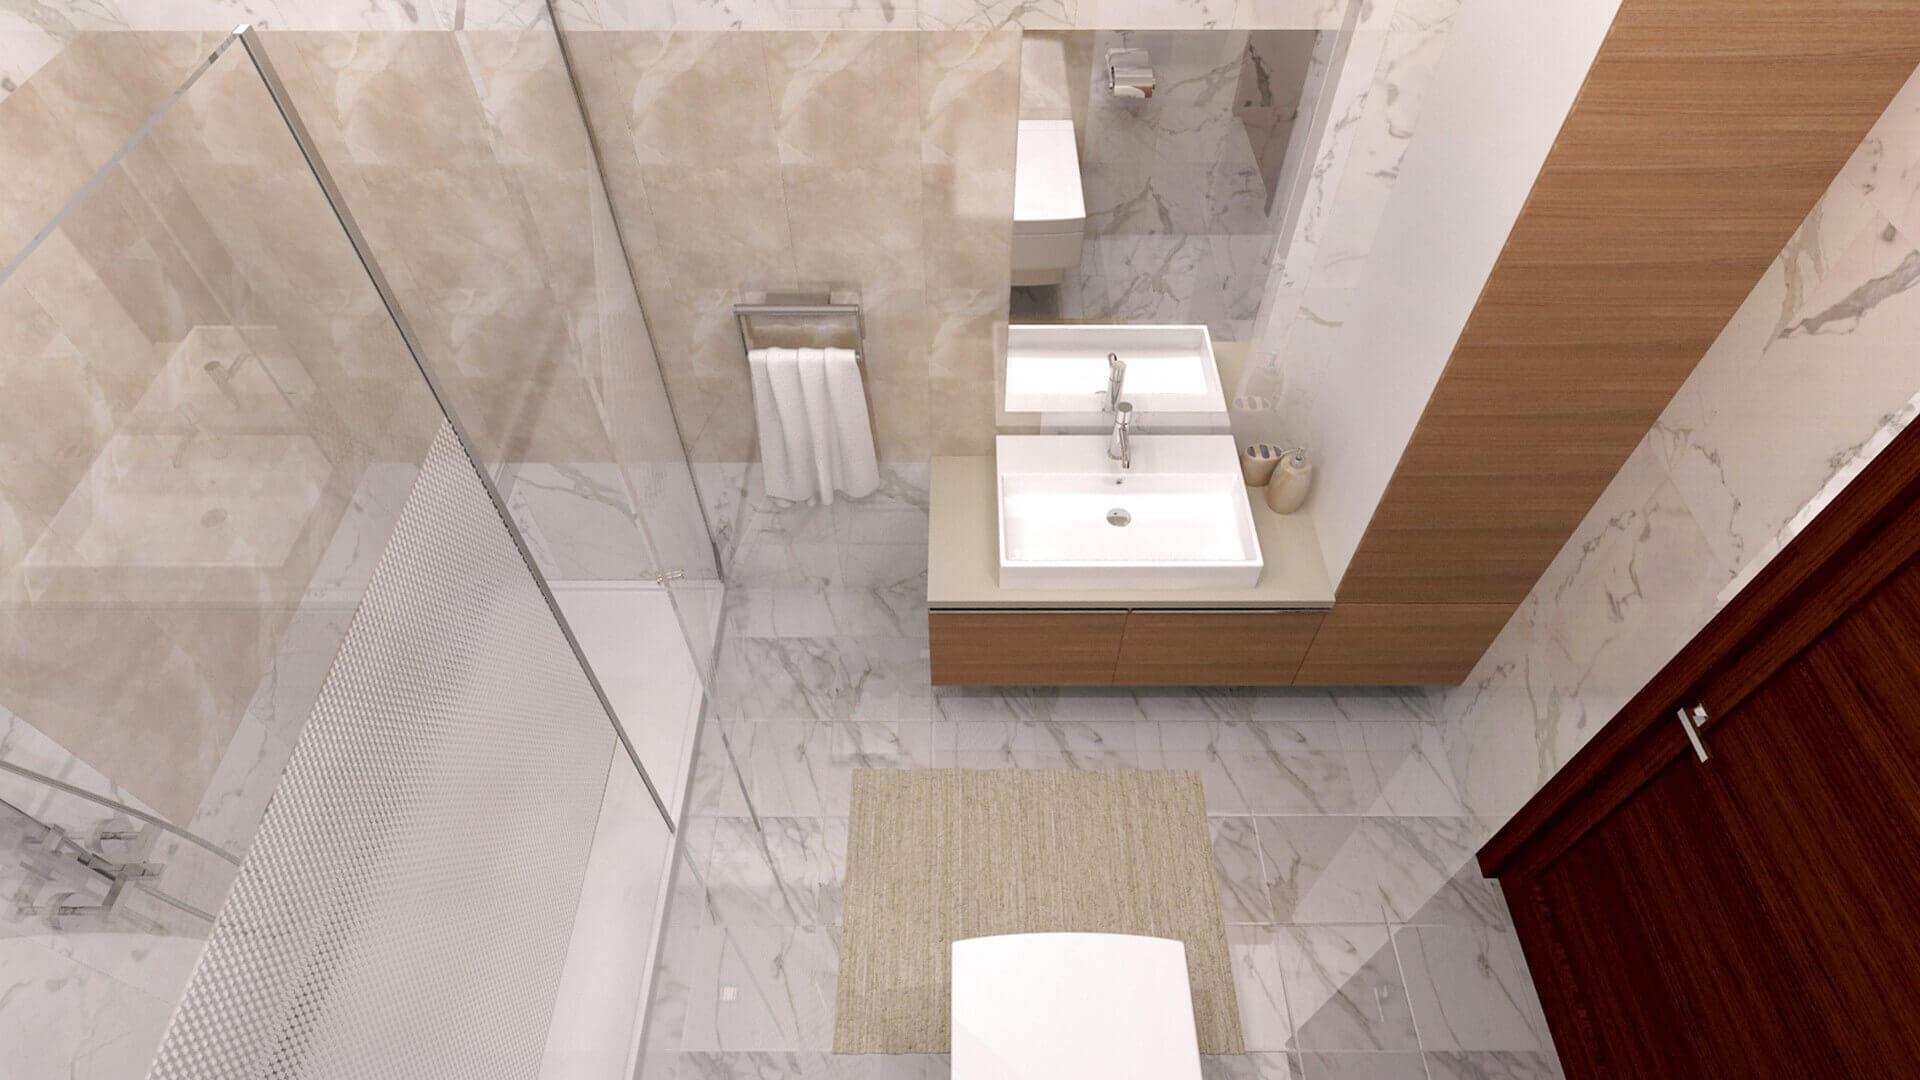 House interior decoration 3421 M. Kavacik Flat Residential